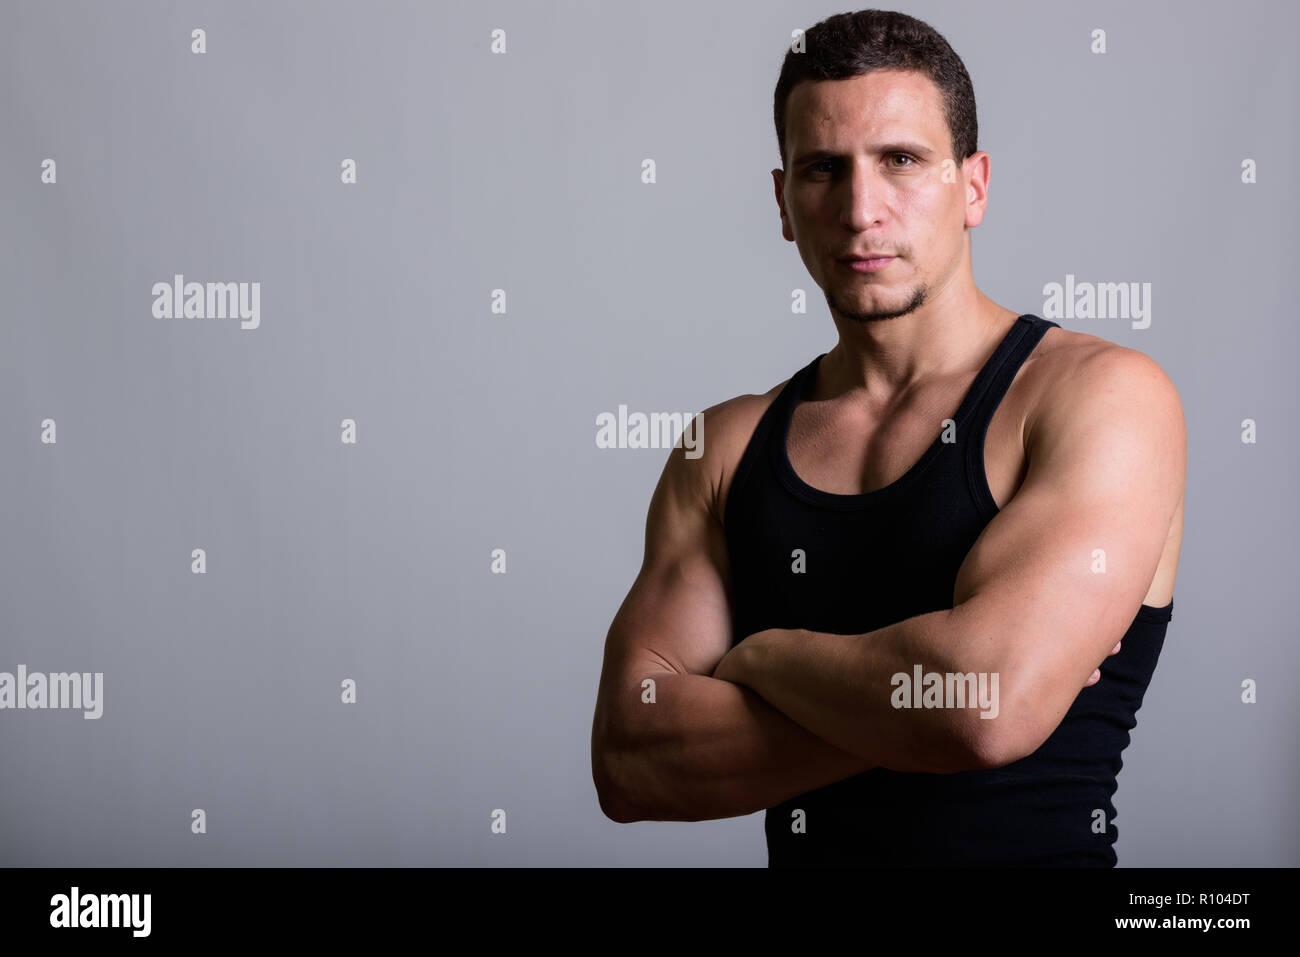 Studio shot of young muscular Persian man wearing sleeveless wit - Stock Image